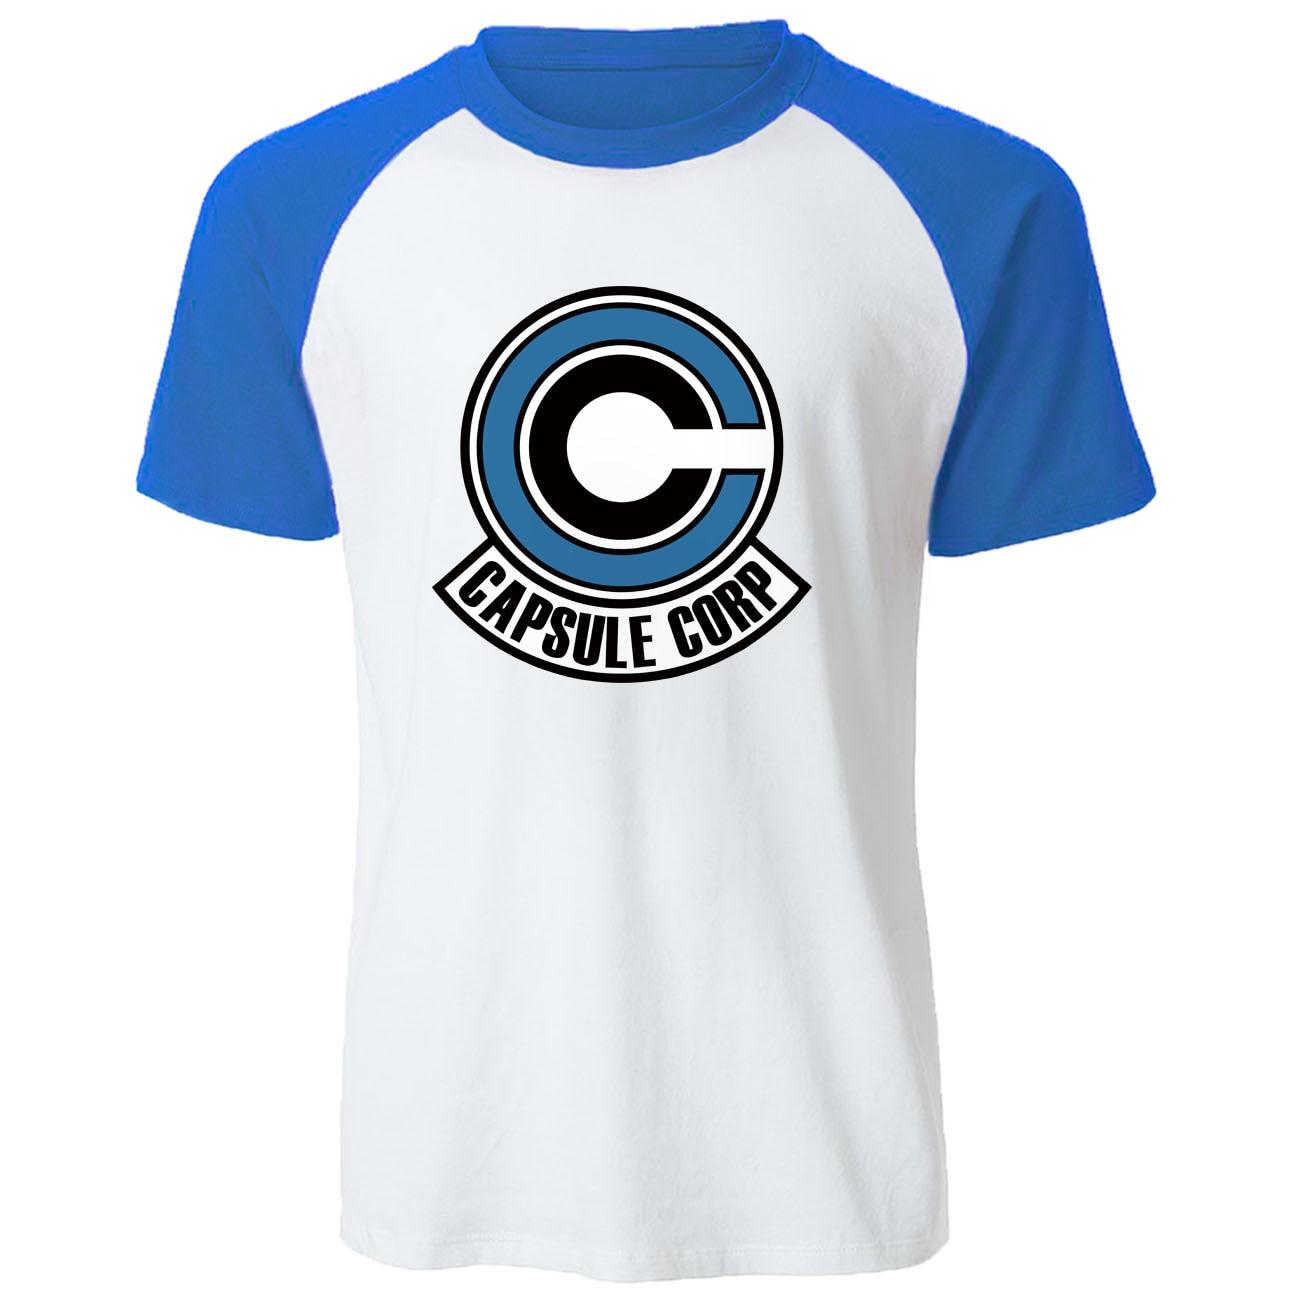 Anime Dragon Ball Z Men T Shirt 2019 New Summer 100% Cotton Raglan Harajuku Mens T-shirt Fashion Capsule Corp Print Tops Tees